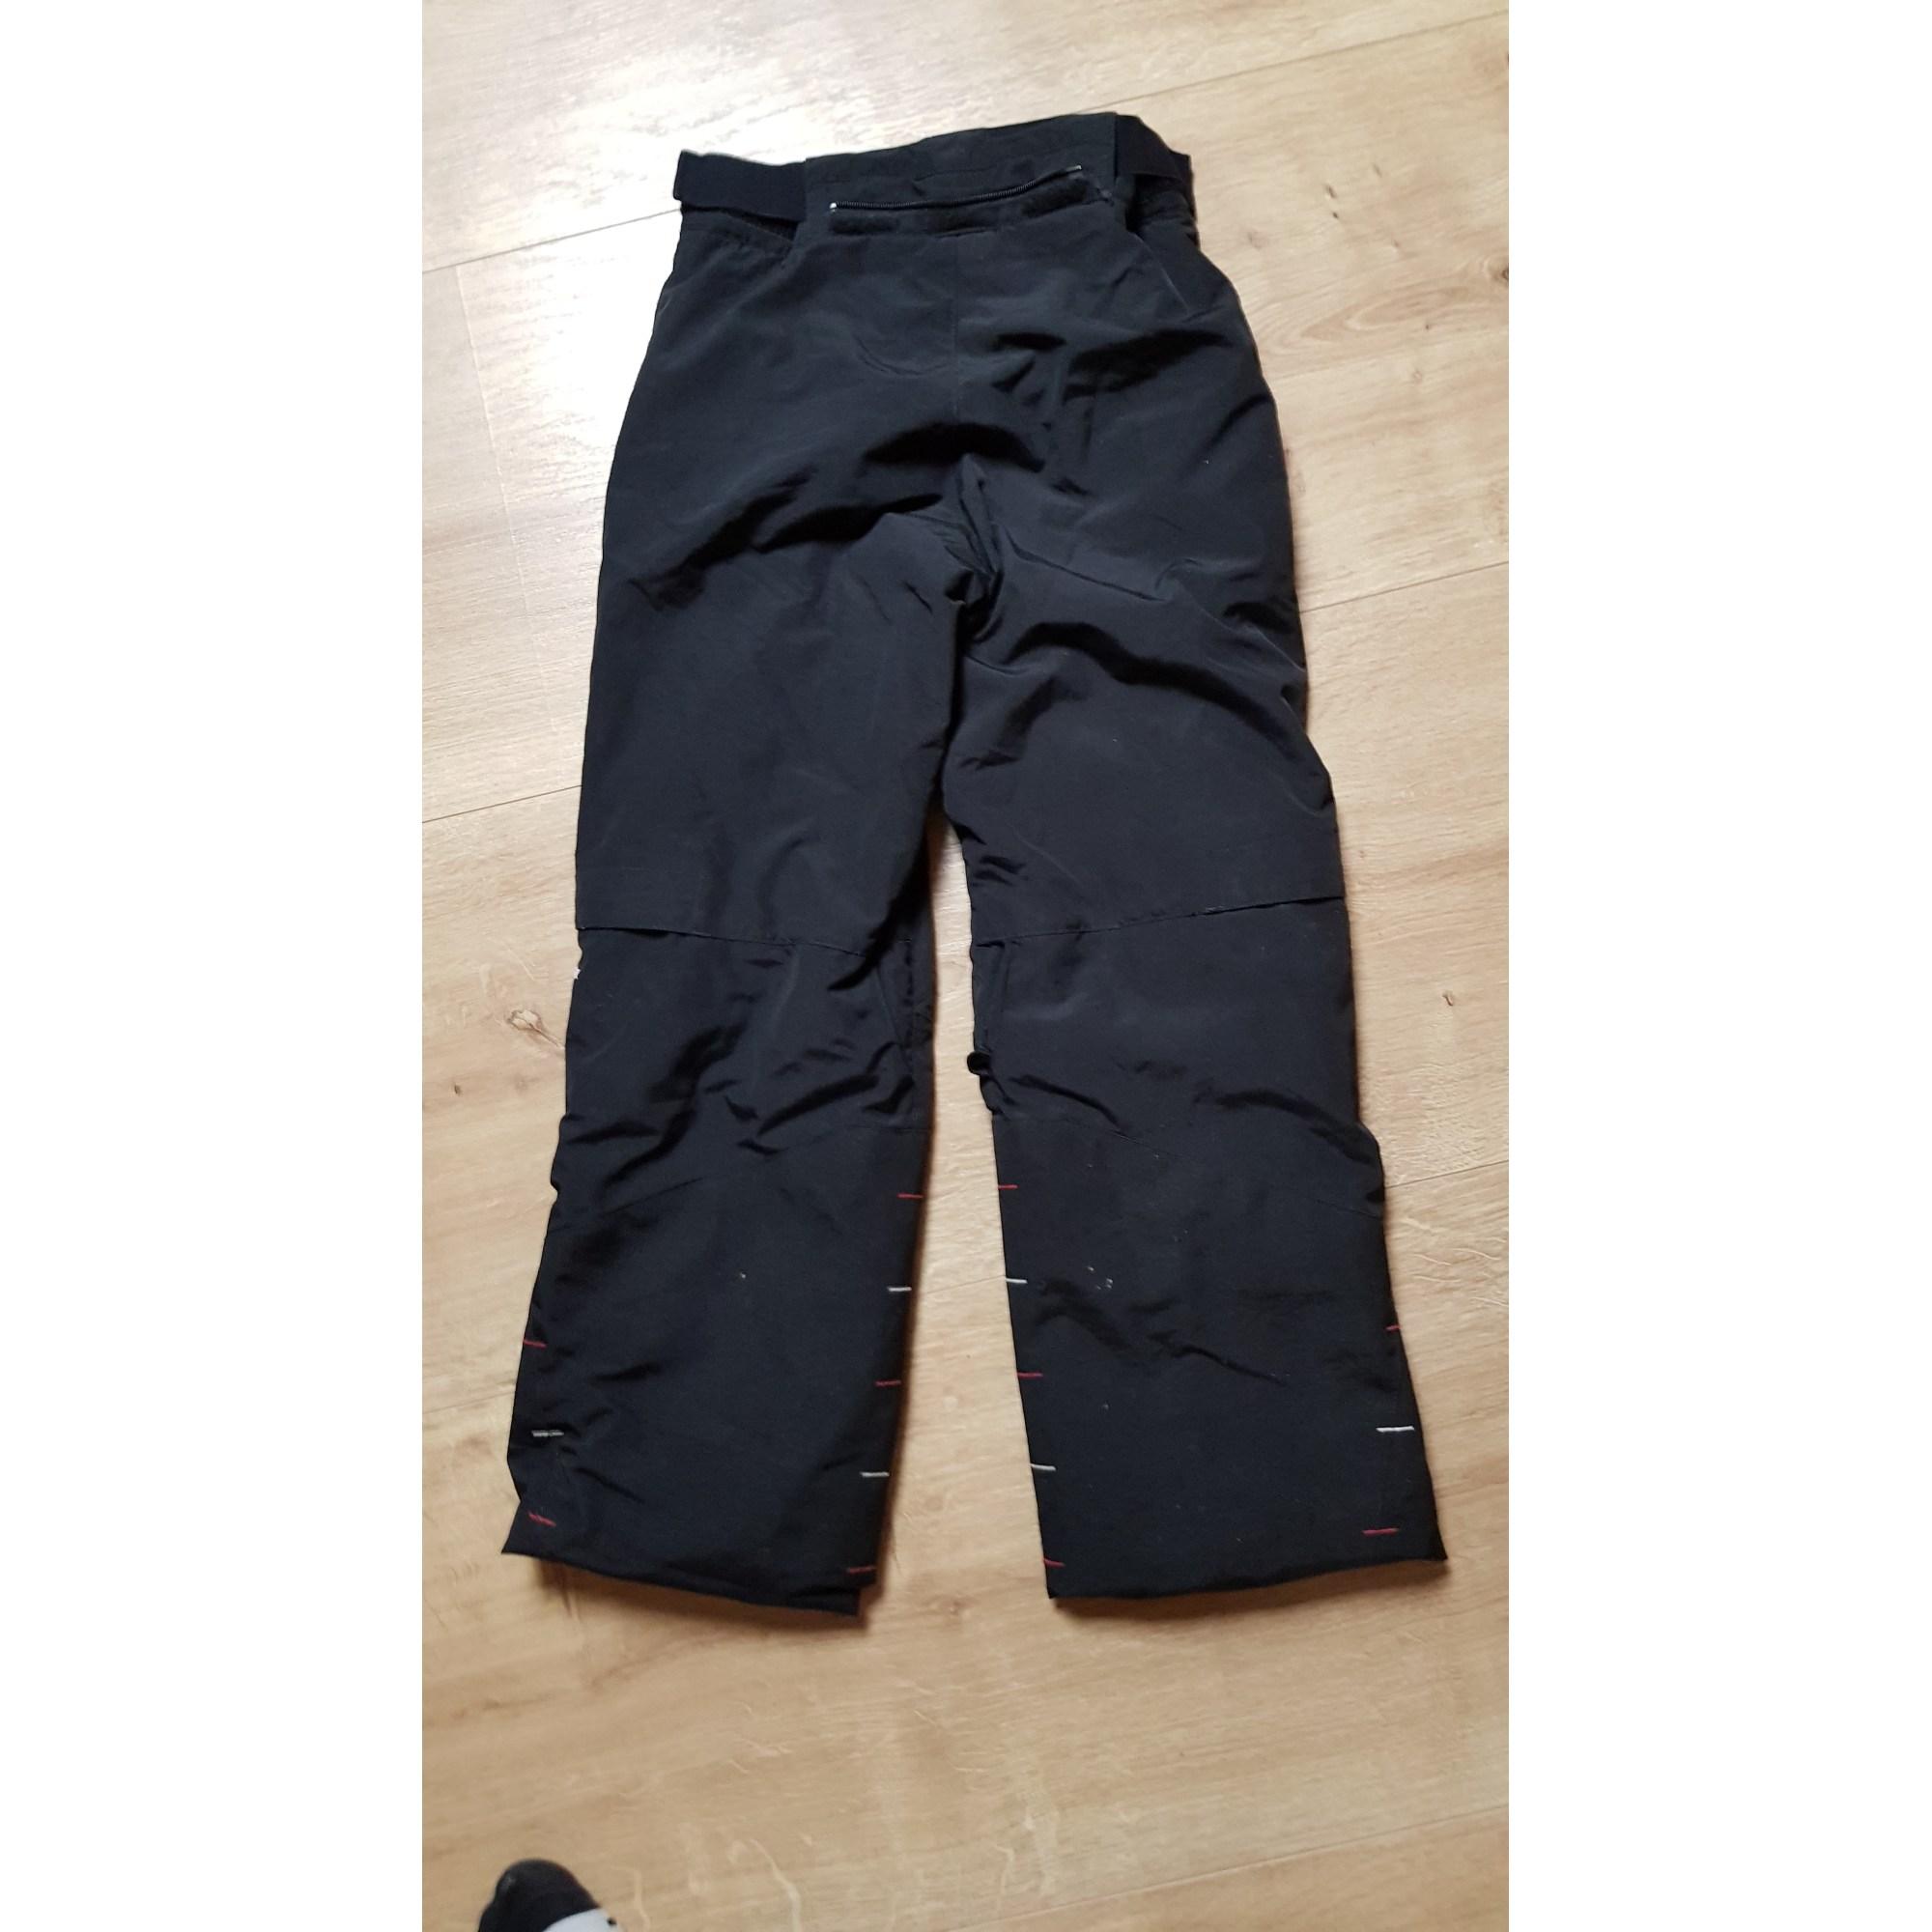 Pantalon De Ski Decathlon 5 6 Ans Noir 6793360